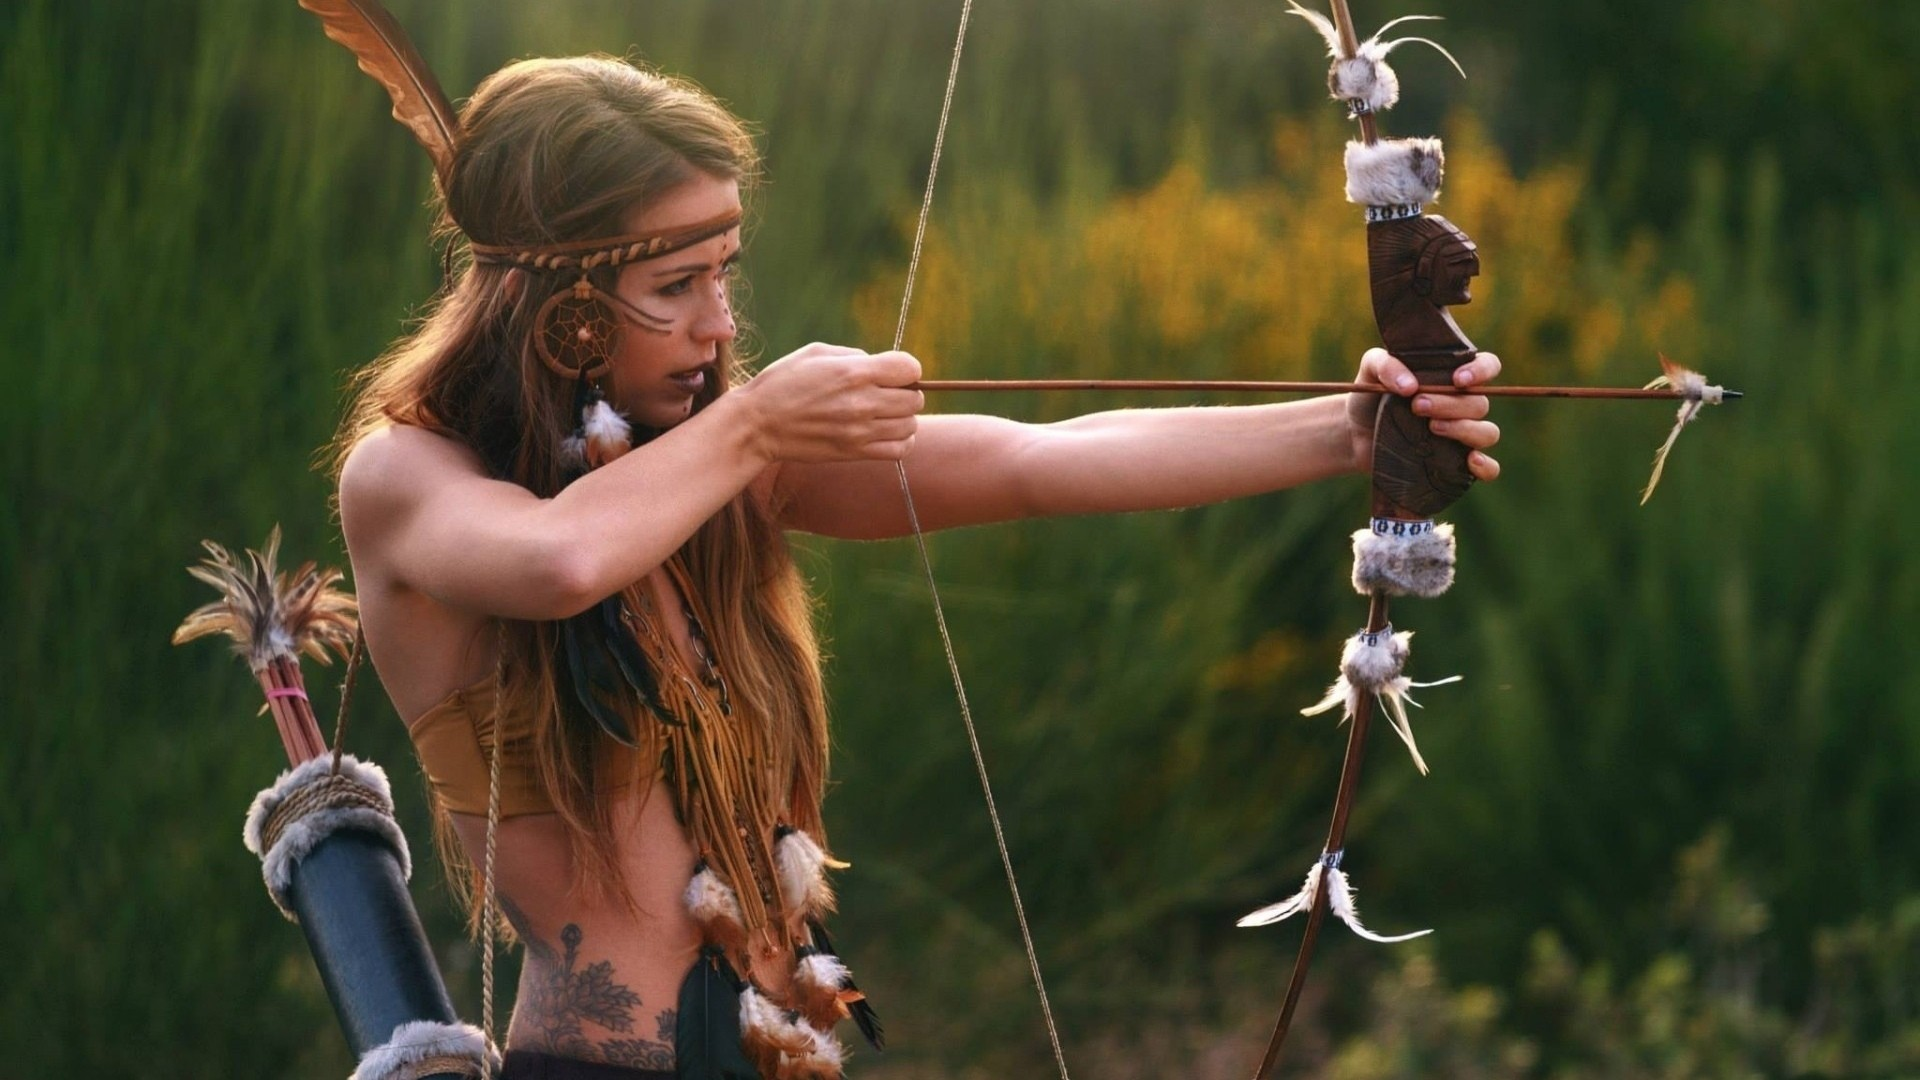 Archery Wallpaper